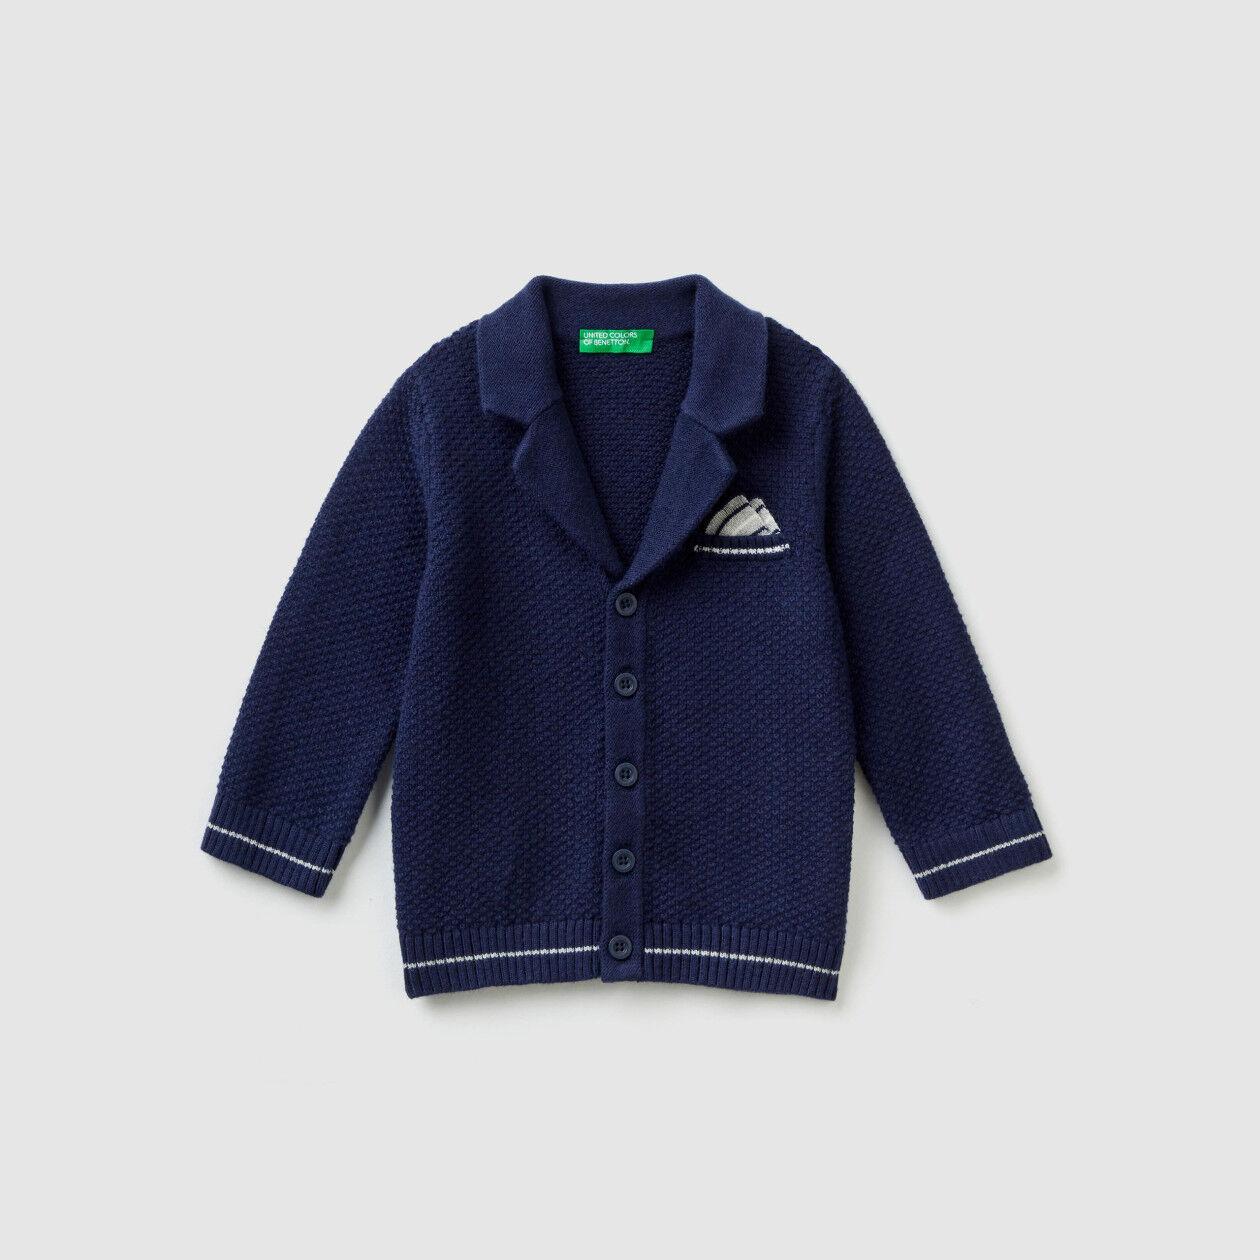 Gilet style blazer